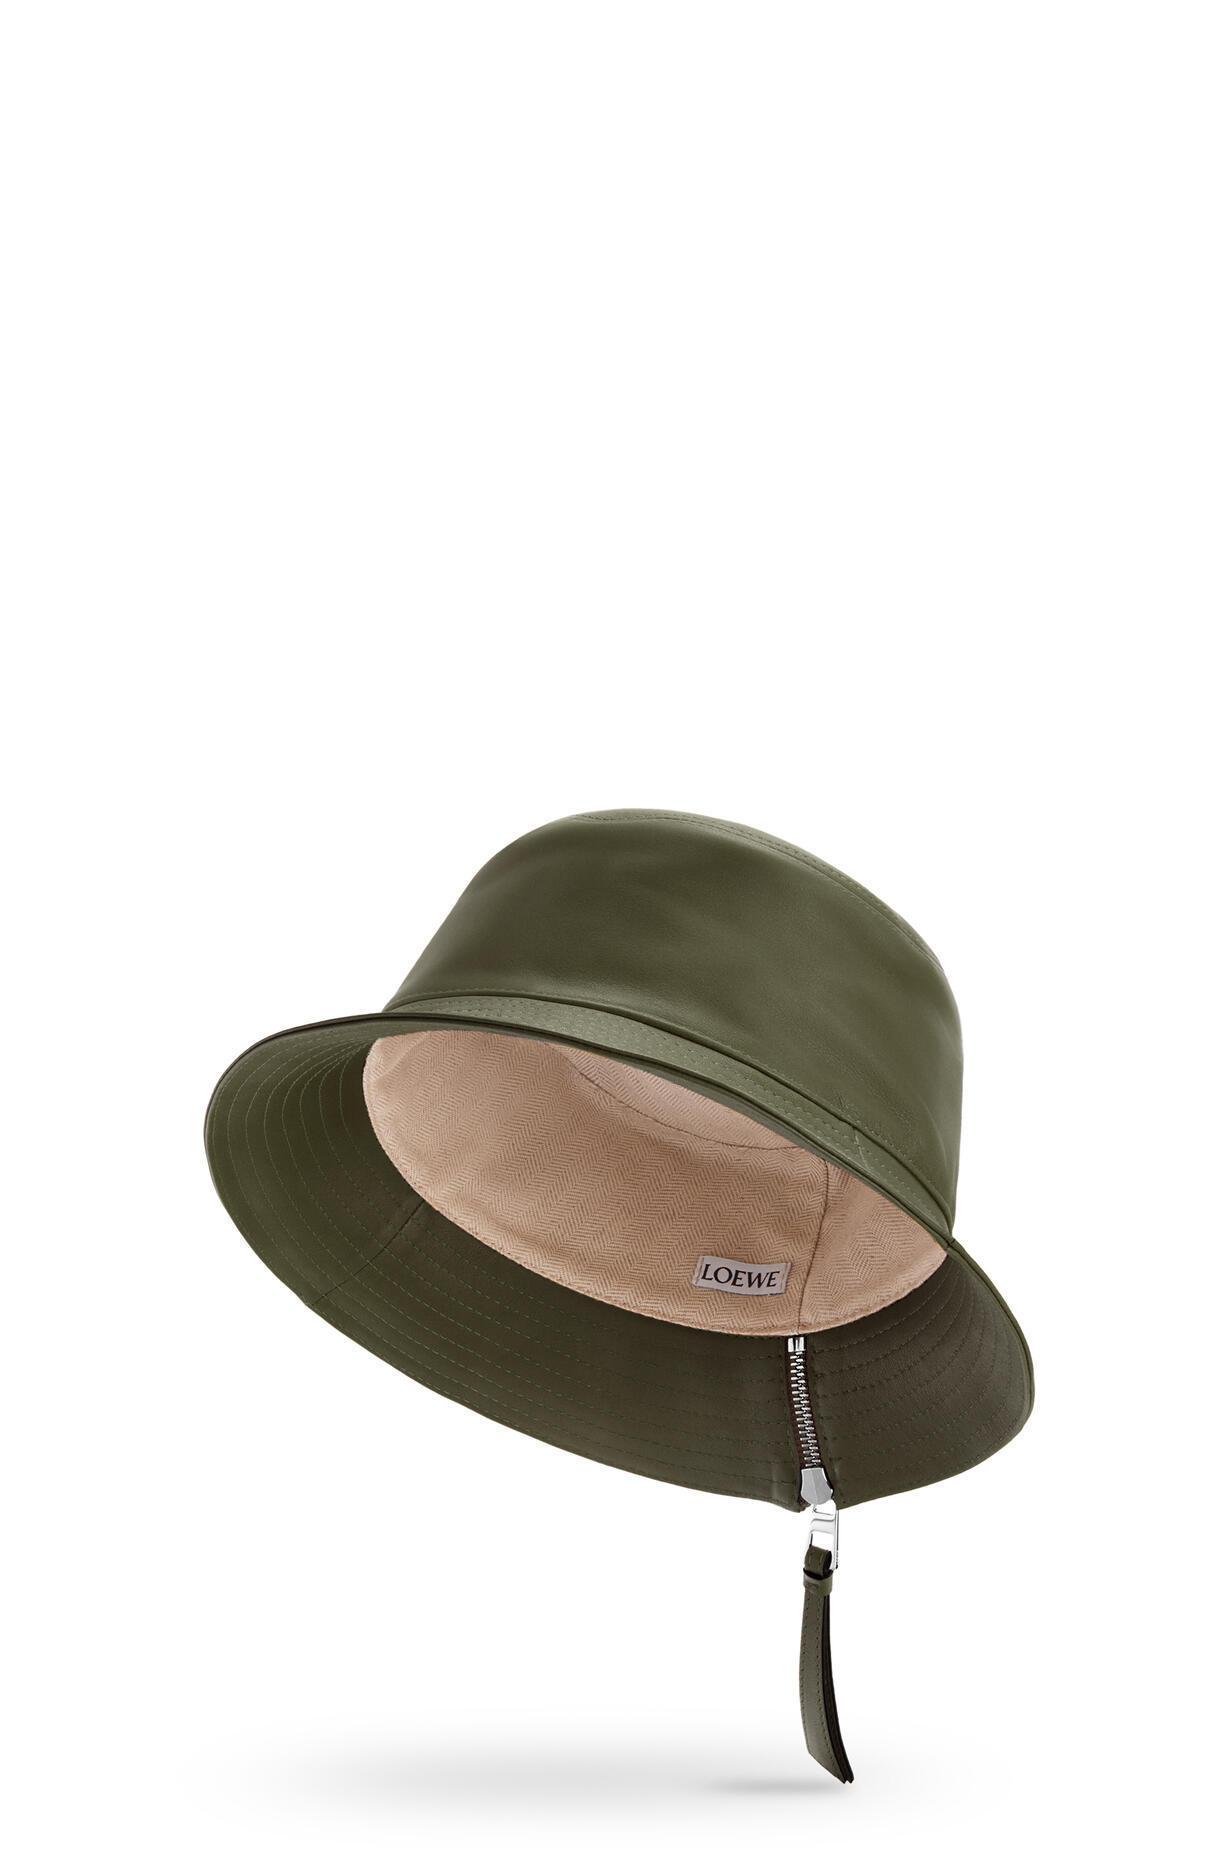 LOEWE LOEWE ☆Fisherman hat in nappa calfskin ☆112.10.010